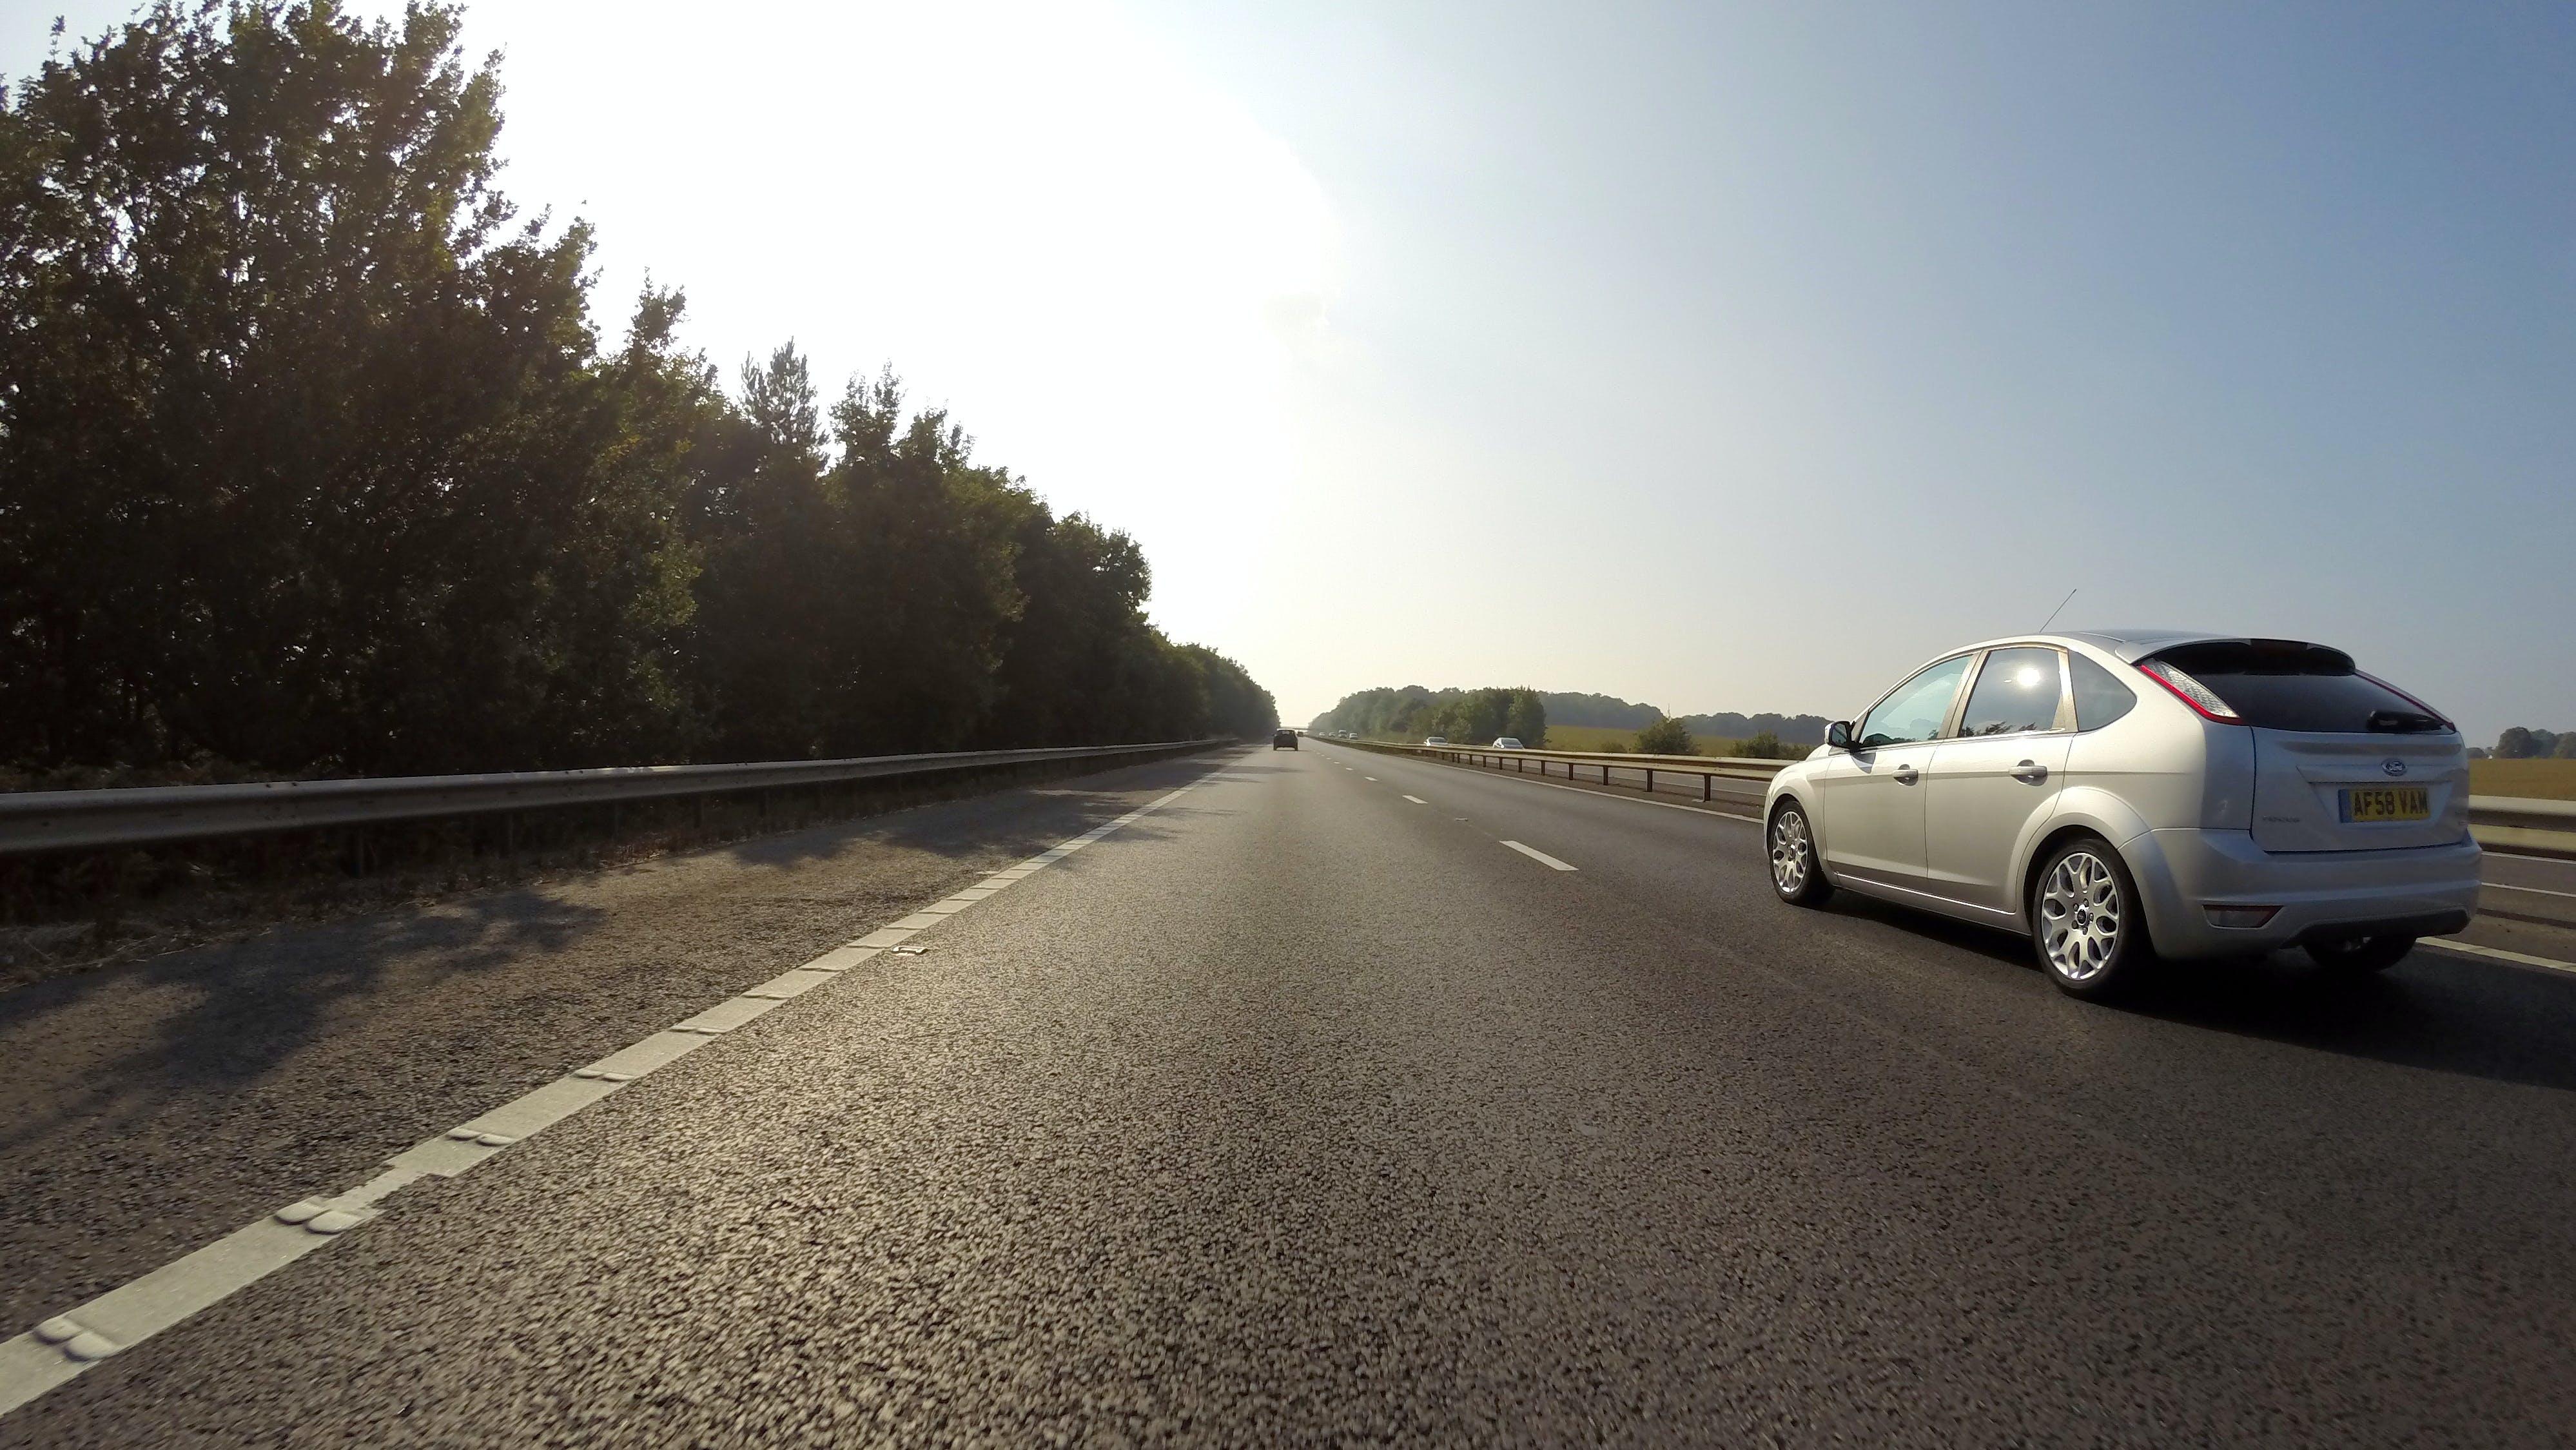 Silver Ford Focus 5-door Hatchback Speeding on Road